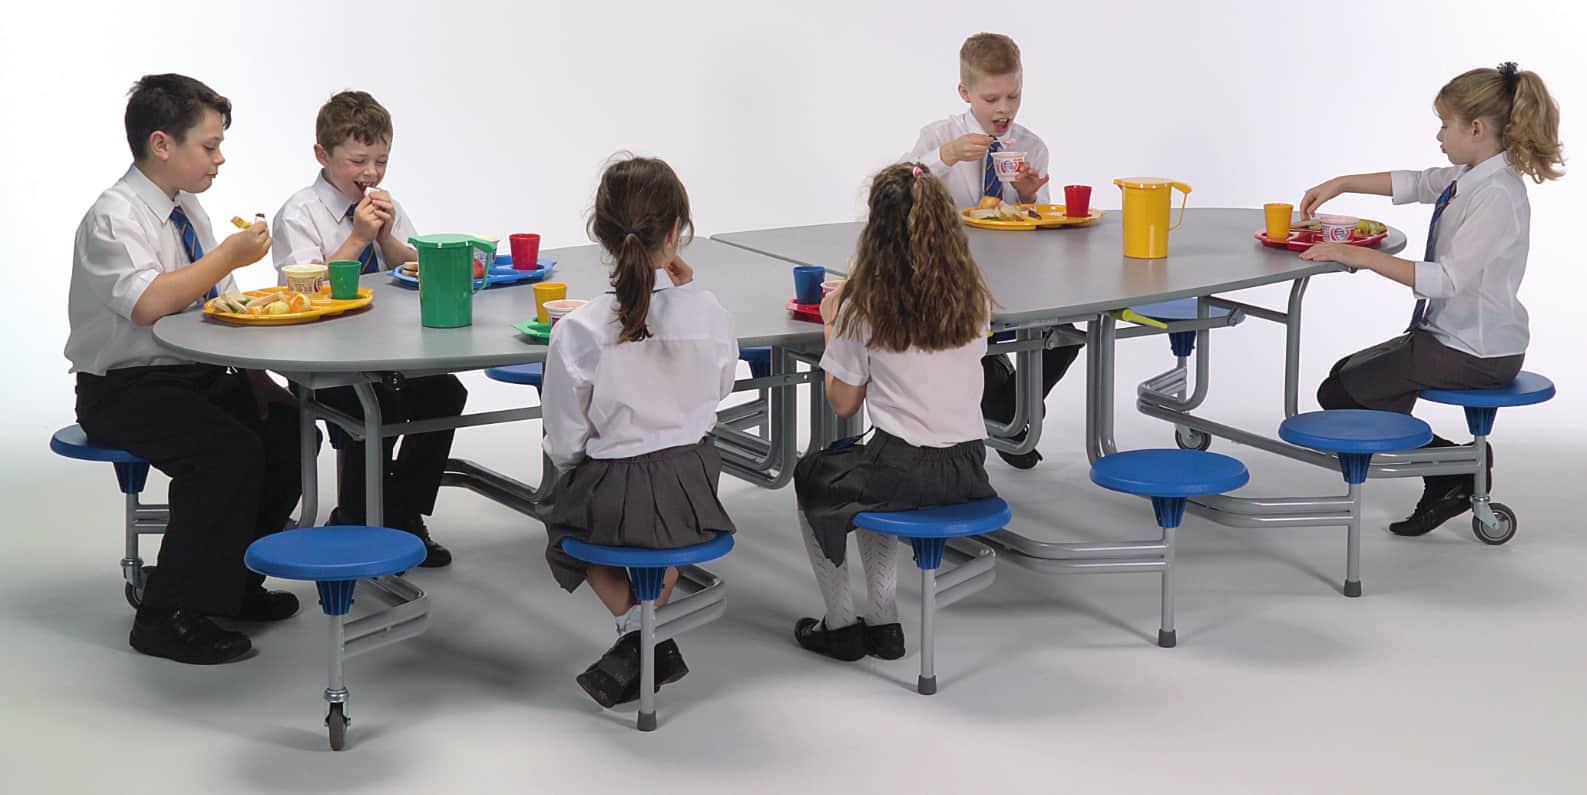 Mesa plegable con asientos comunicator mesas plegables for Mesa plegable con asientos